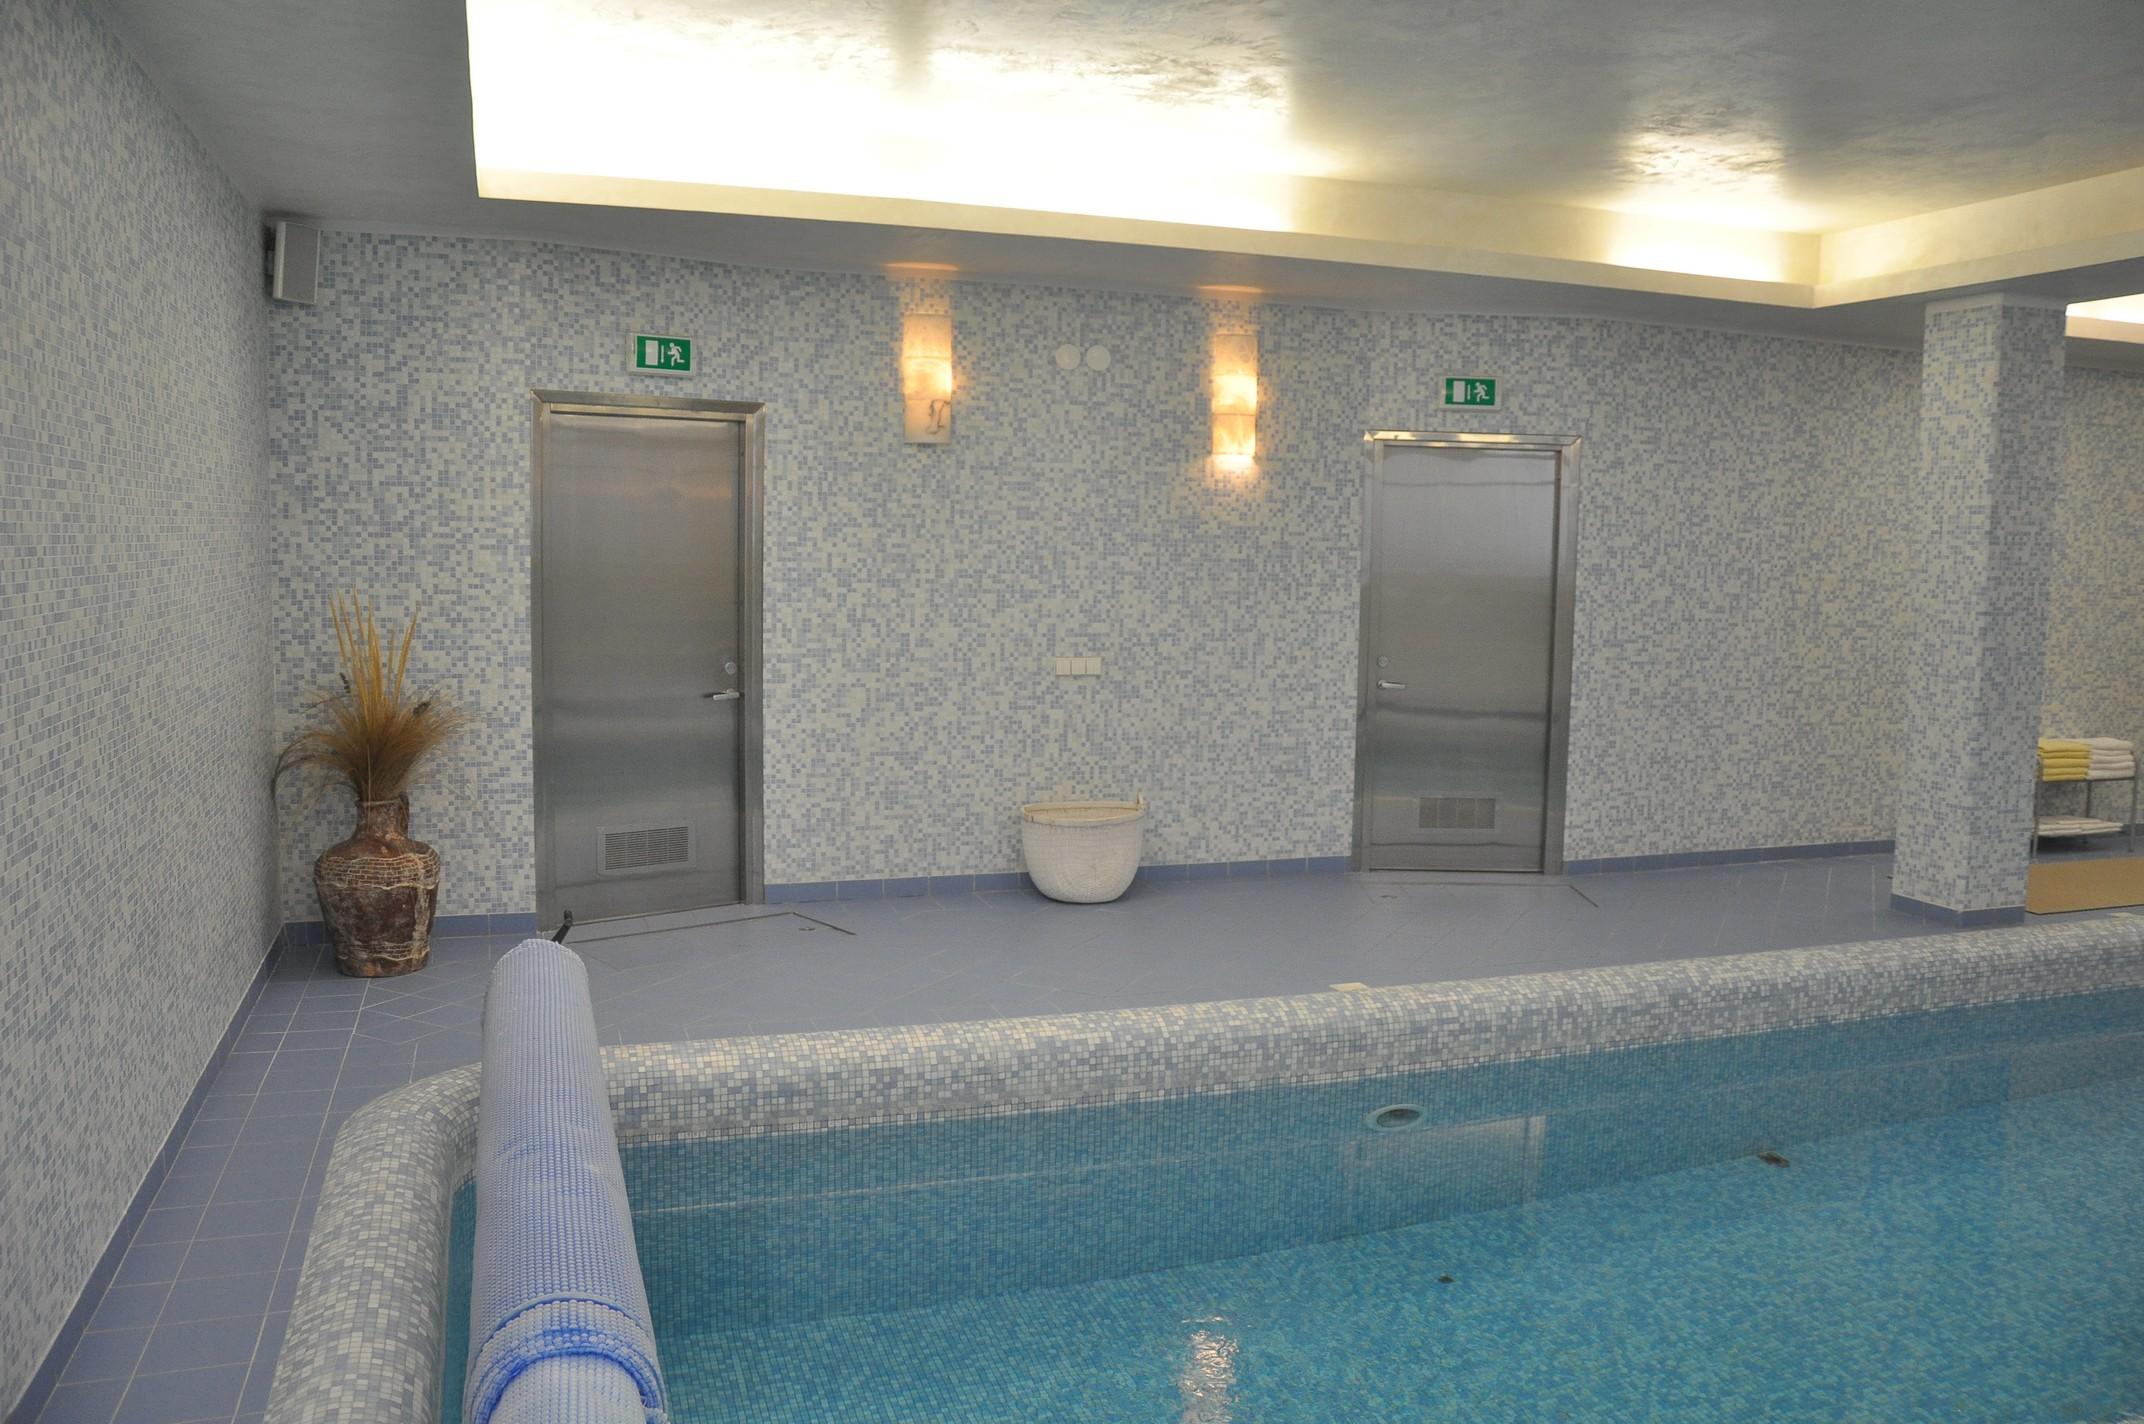 Artis Centrum Hotels, Vilnius